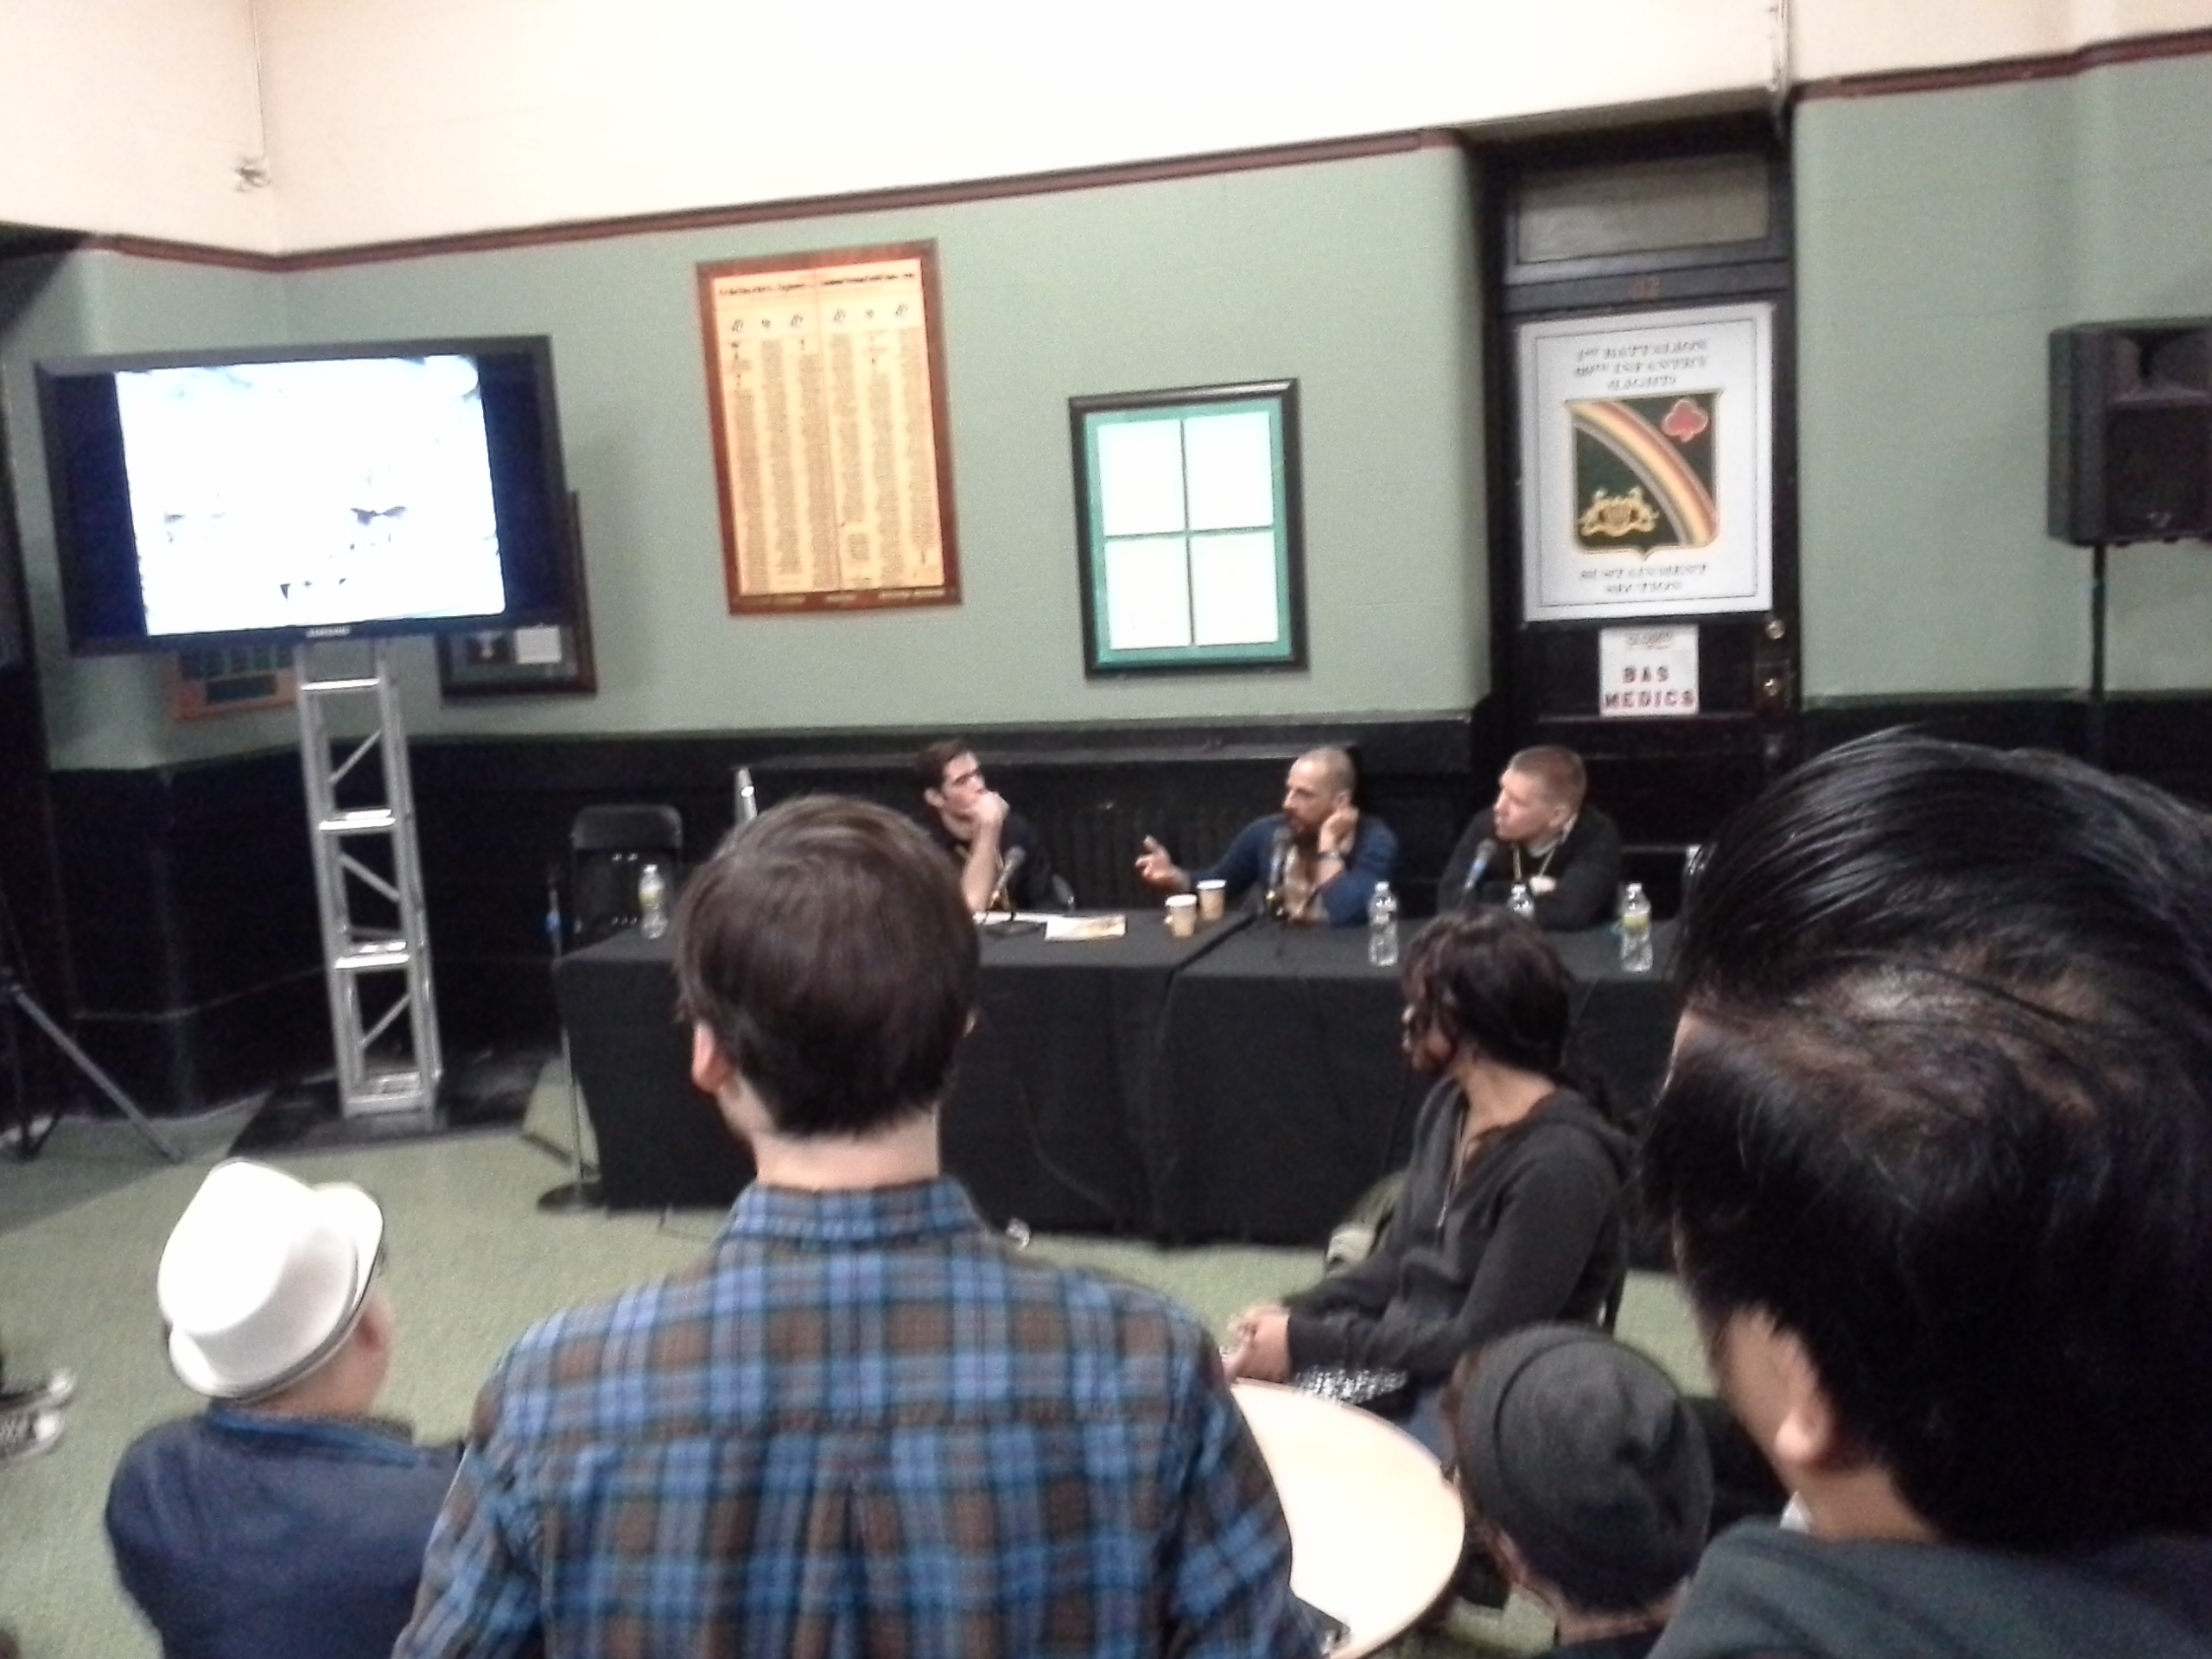 Josh Bayer's Panel